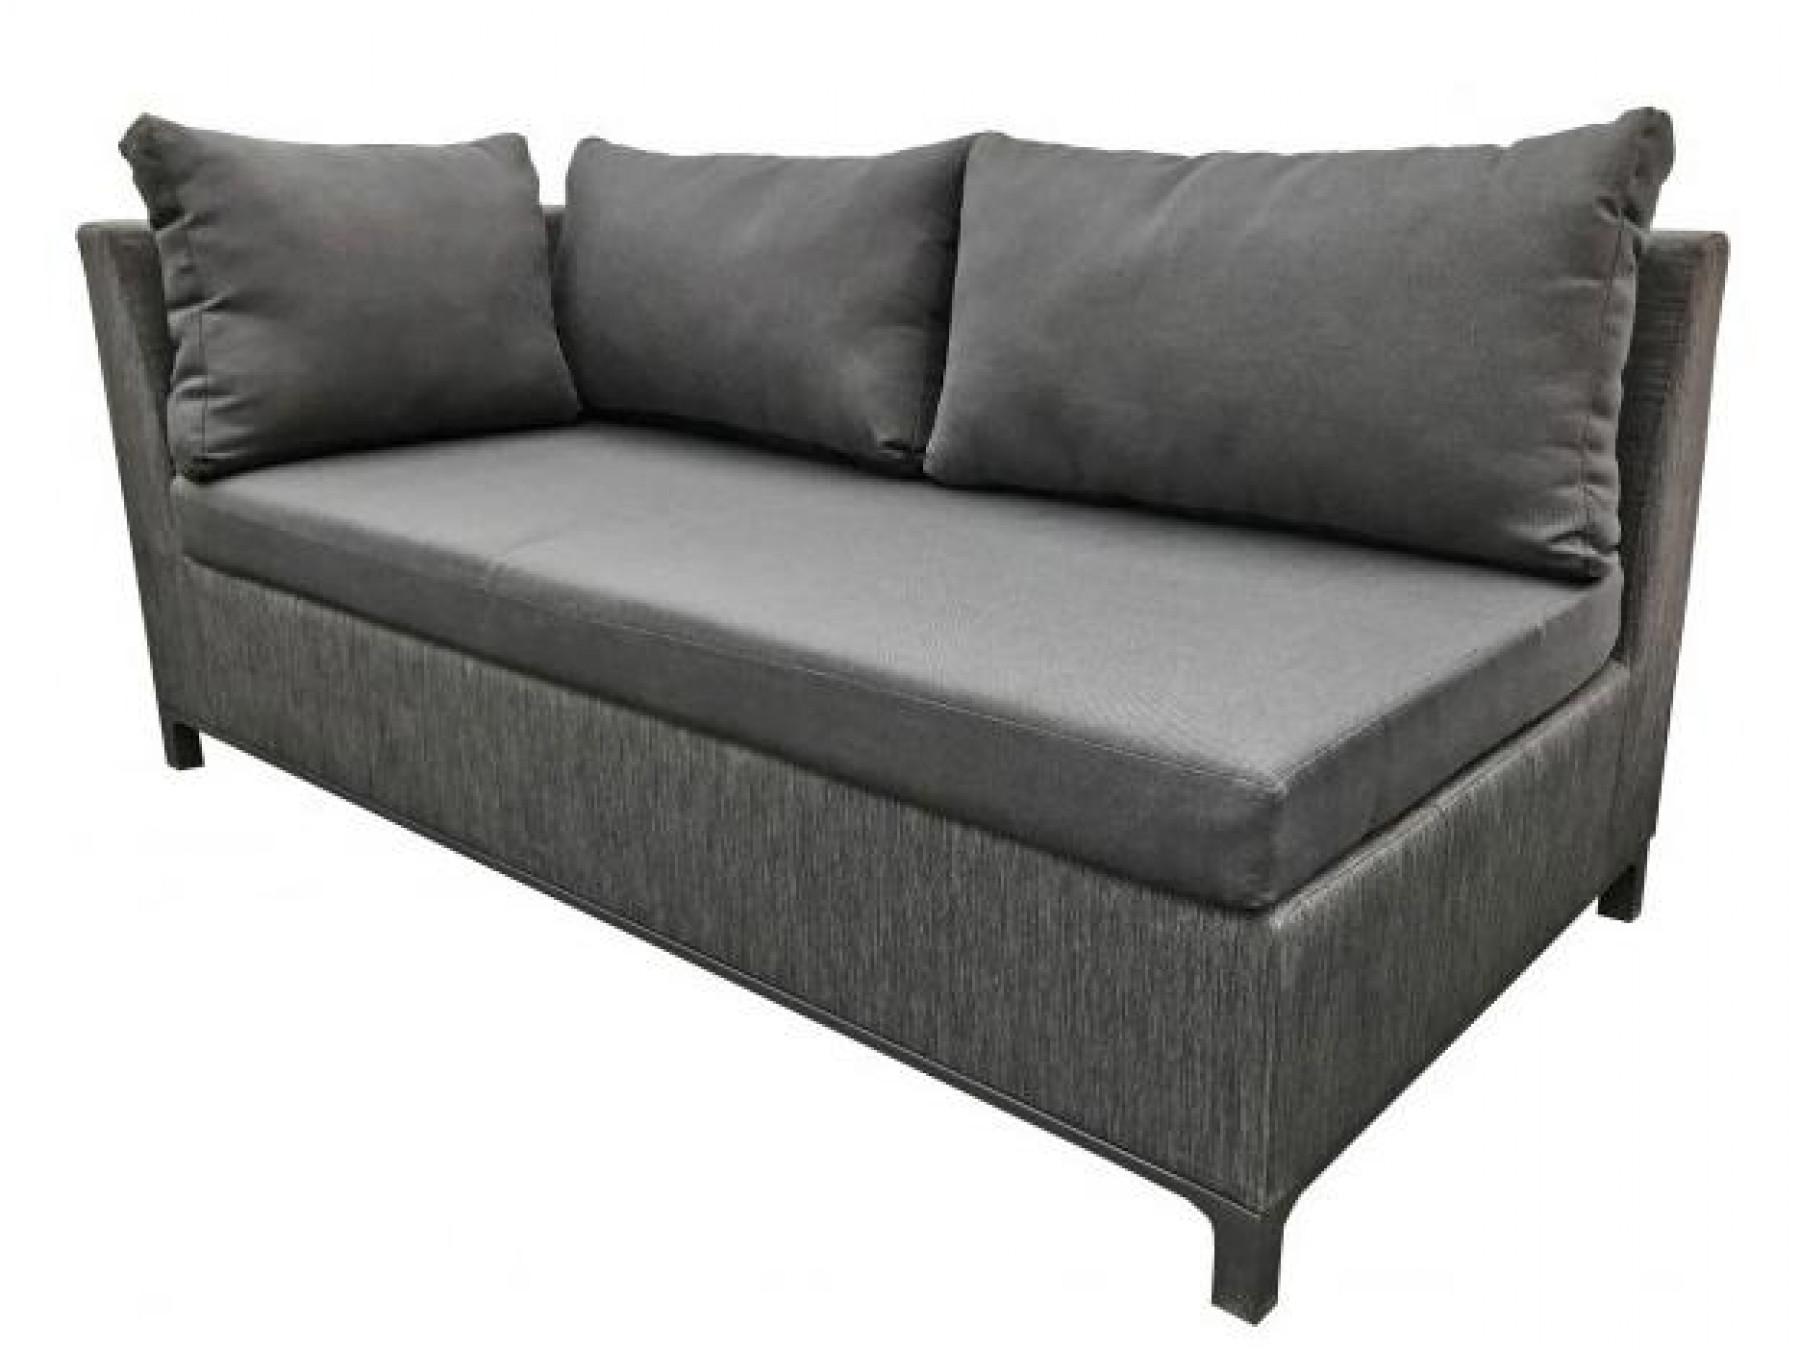 Full Size of Gartensofa 2 Sitzer Polyrattan Garten Couch Ausziehbar Sofa Aluminium Vidaxl 2 Sitzer Massivholz Akazie Rattan Tierra Acro 2er Element Rechts 3 1 Bett 120 Cm Wohnzimmer Gartensofa 2 Sitzer